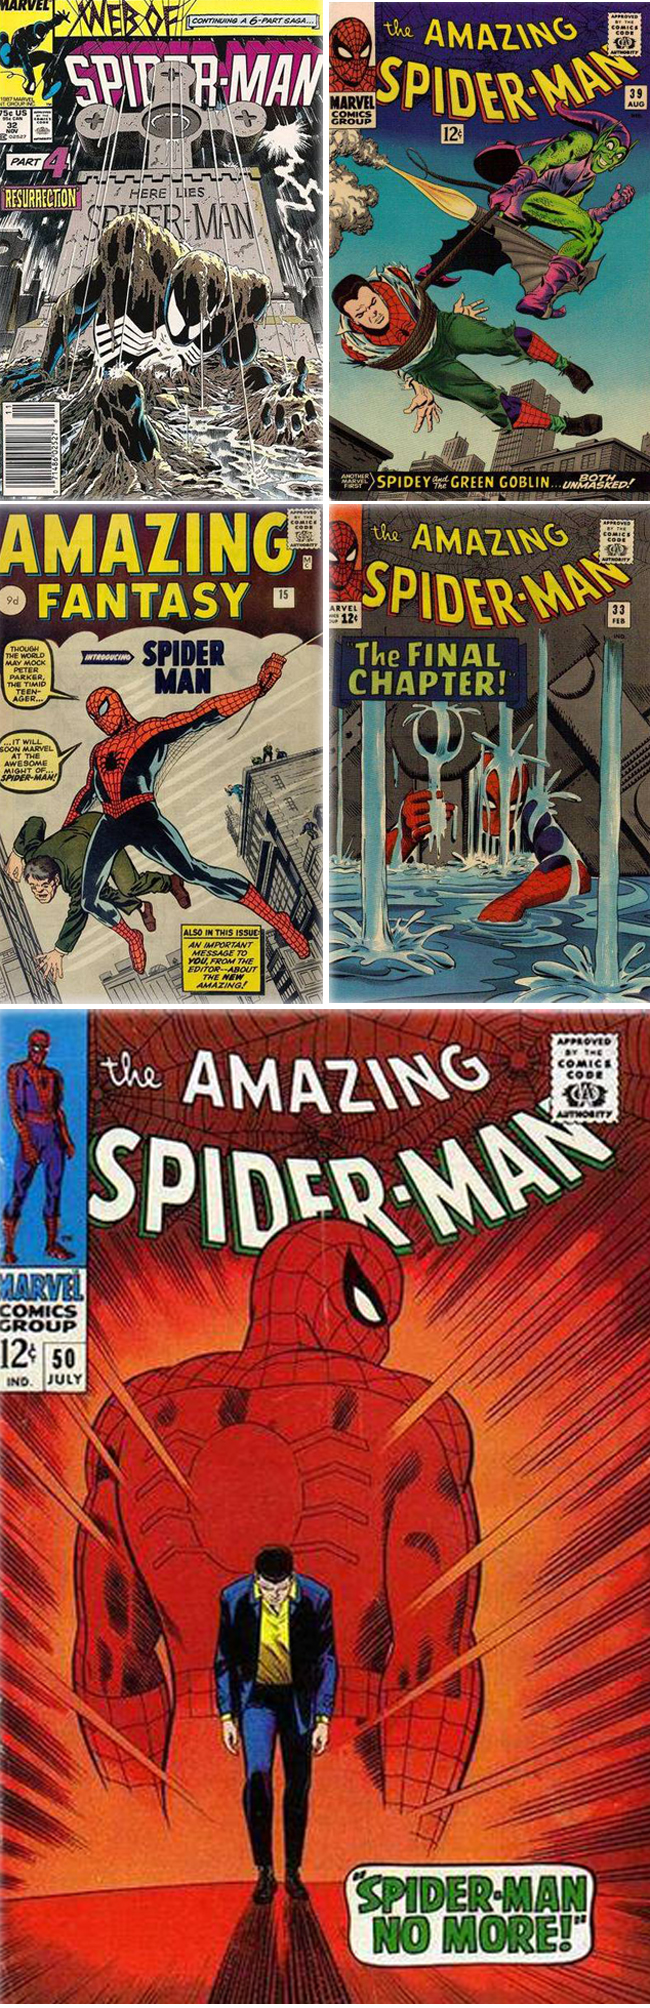 spiderman-comic-portada-madrid-academiac10